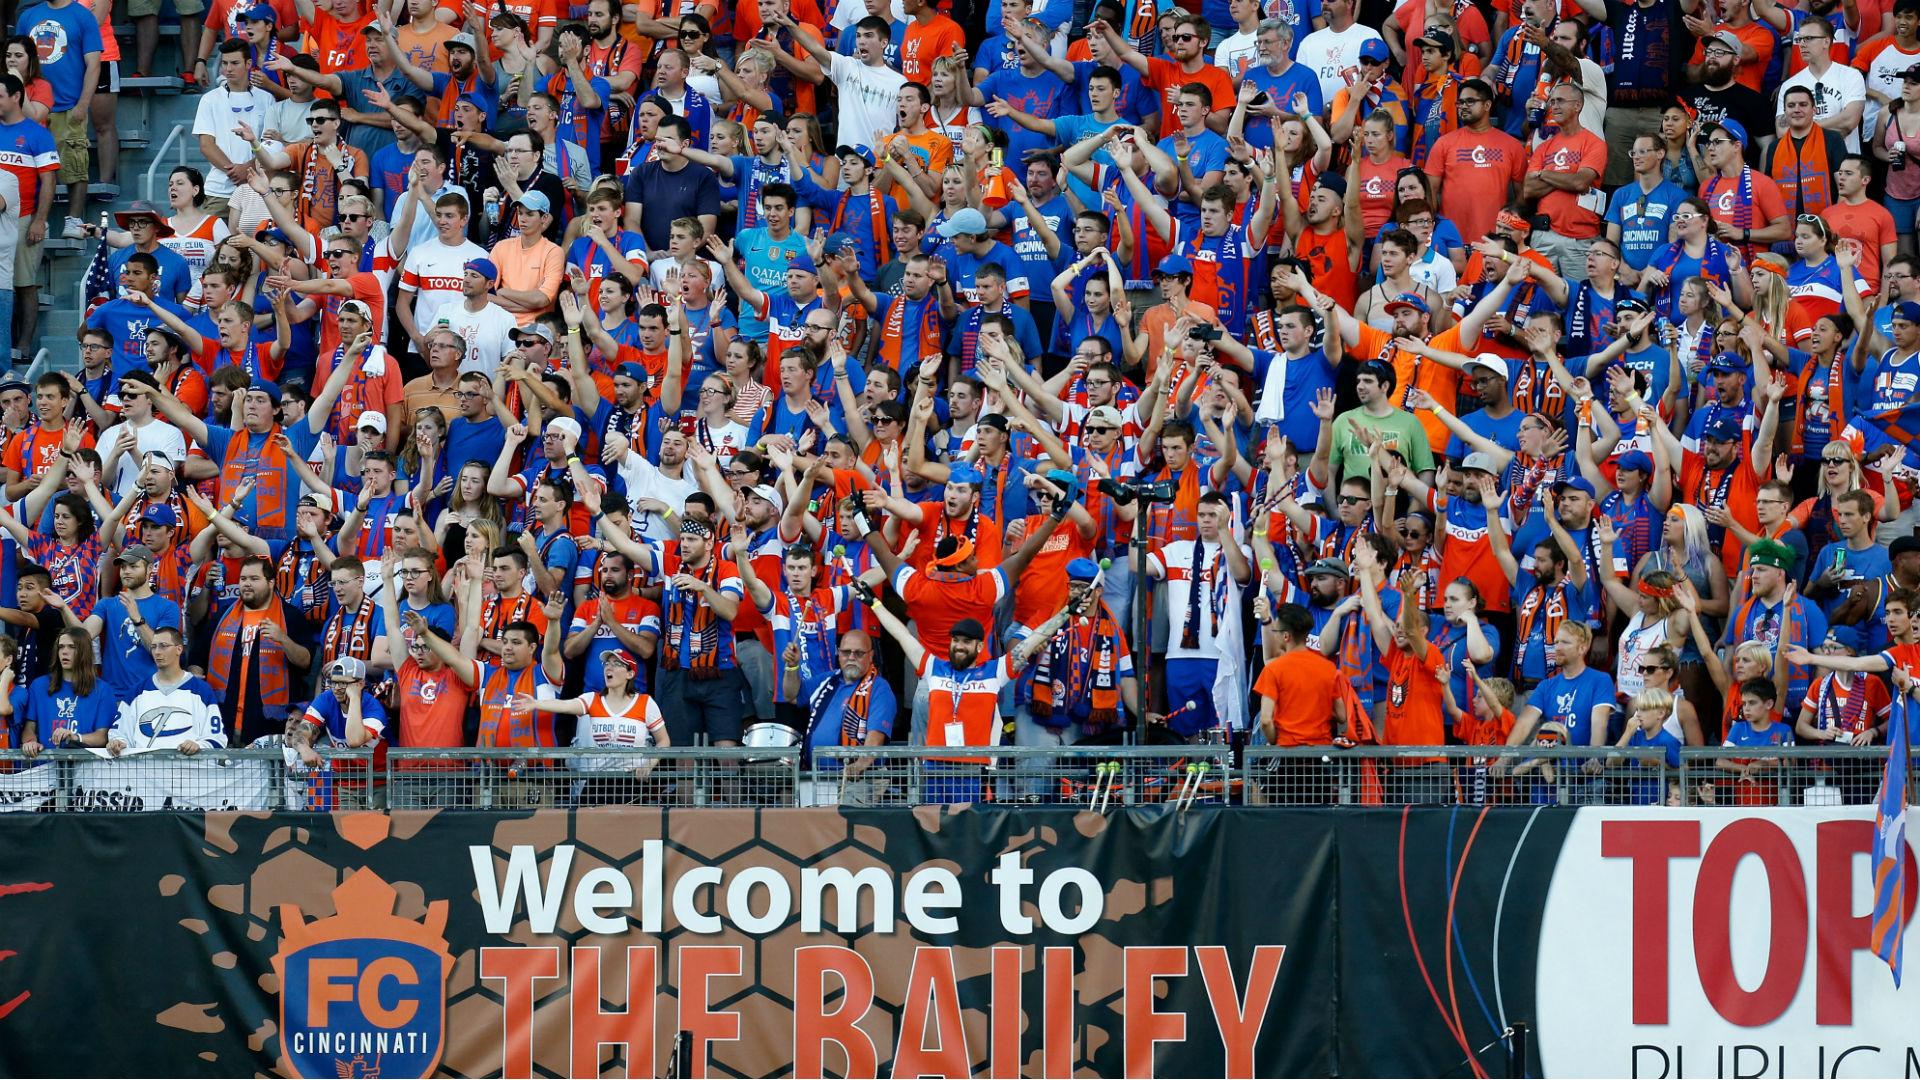 Cincinnati awarded MLS franchise, will begin play in 2019